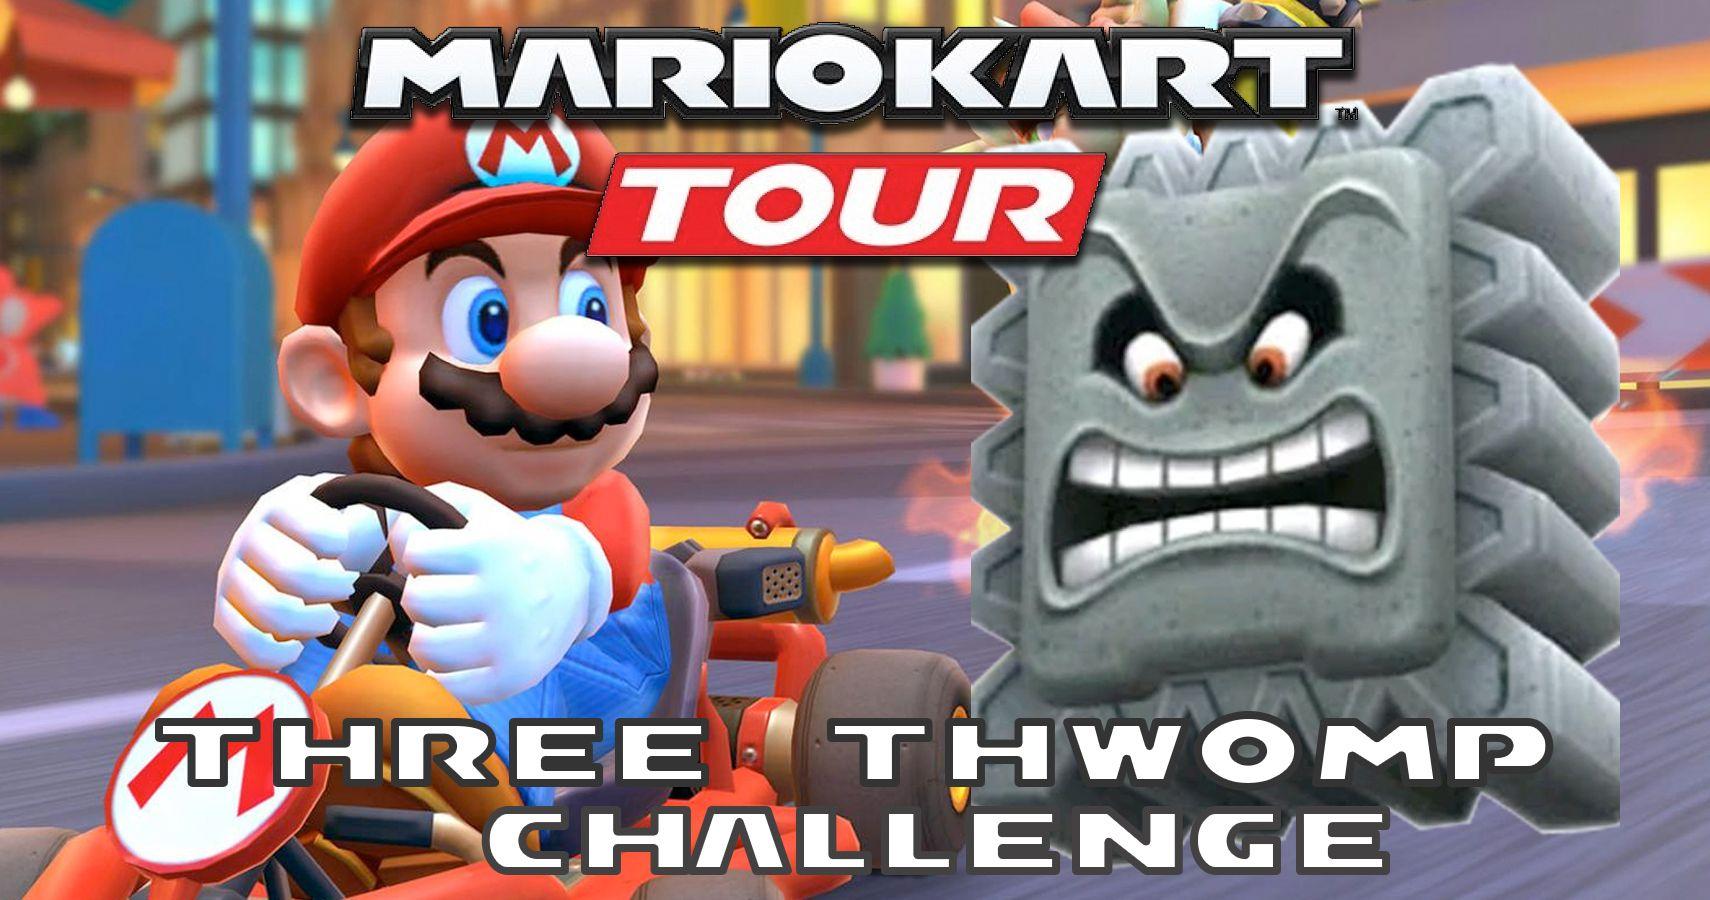 How To Complete Mario Kart Tour S Three Thwomp Challenge